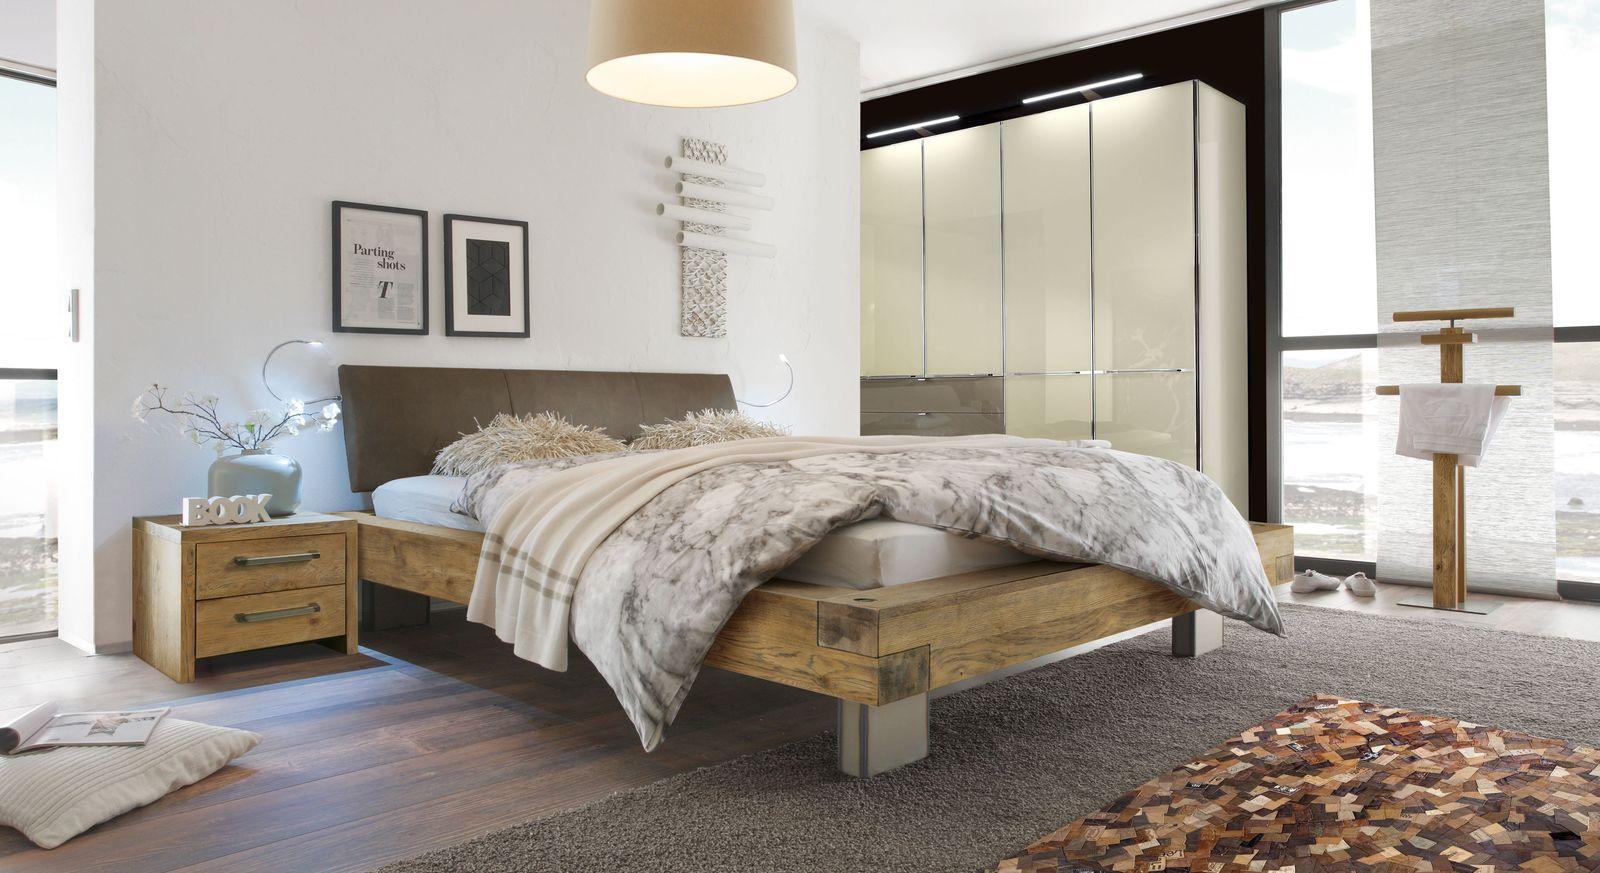 Passende Schlafzimmer-Accessoires zum Bett Limeira